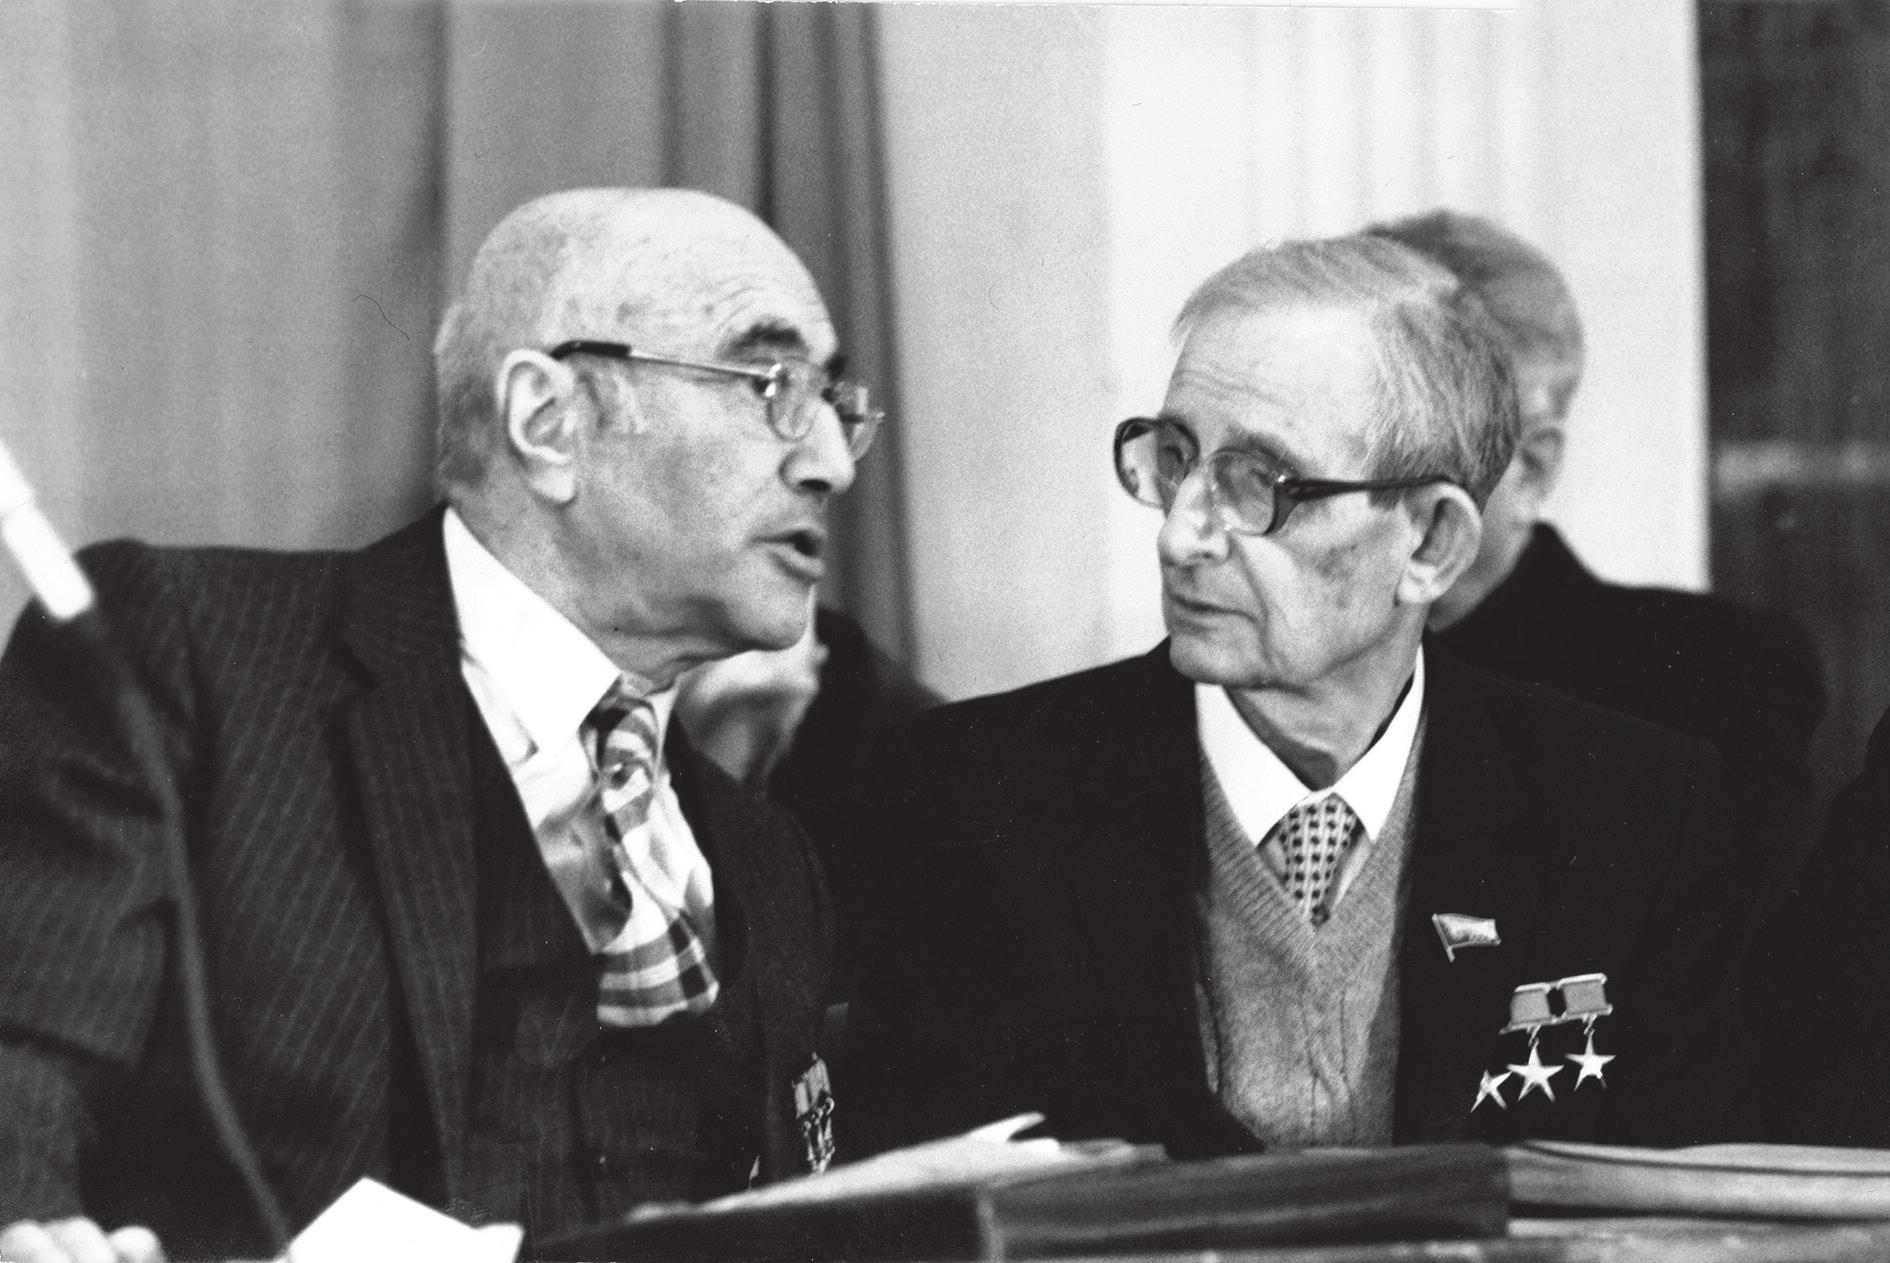 Я. Б. Зельдович и Ю. Б. Харитон на праздновании юбилеев друг друга, 1984 год